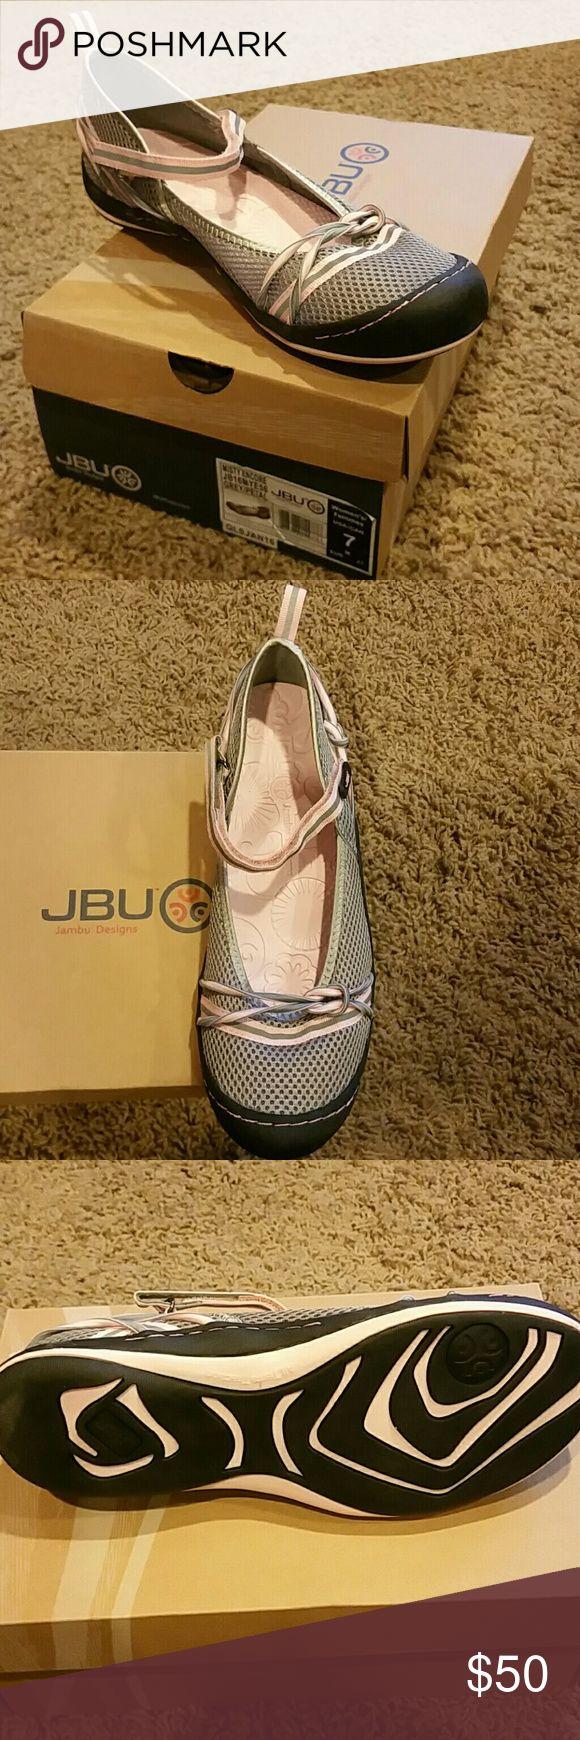 NEW Jambu Aqua Shoes Never worn, new in box Jambu Aqua shoes...great for paddleboarding, snorkeling, scuba, boat wear. Pink and grey. Jambu Shoes Sneakers